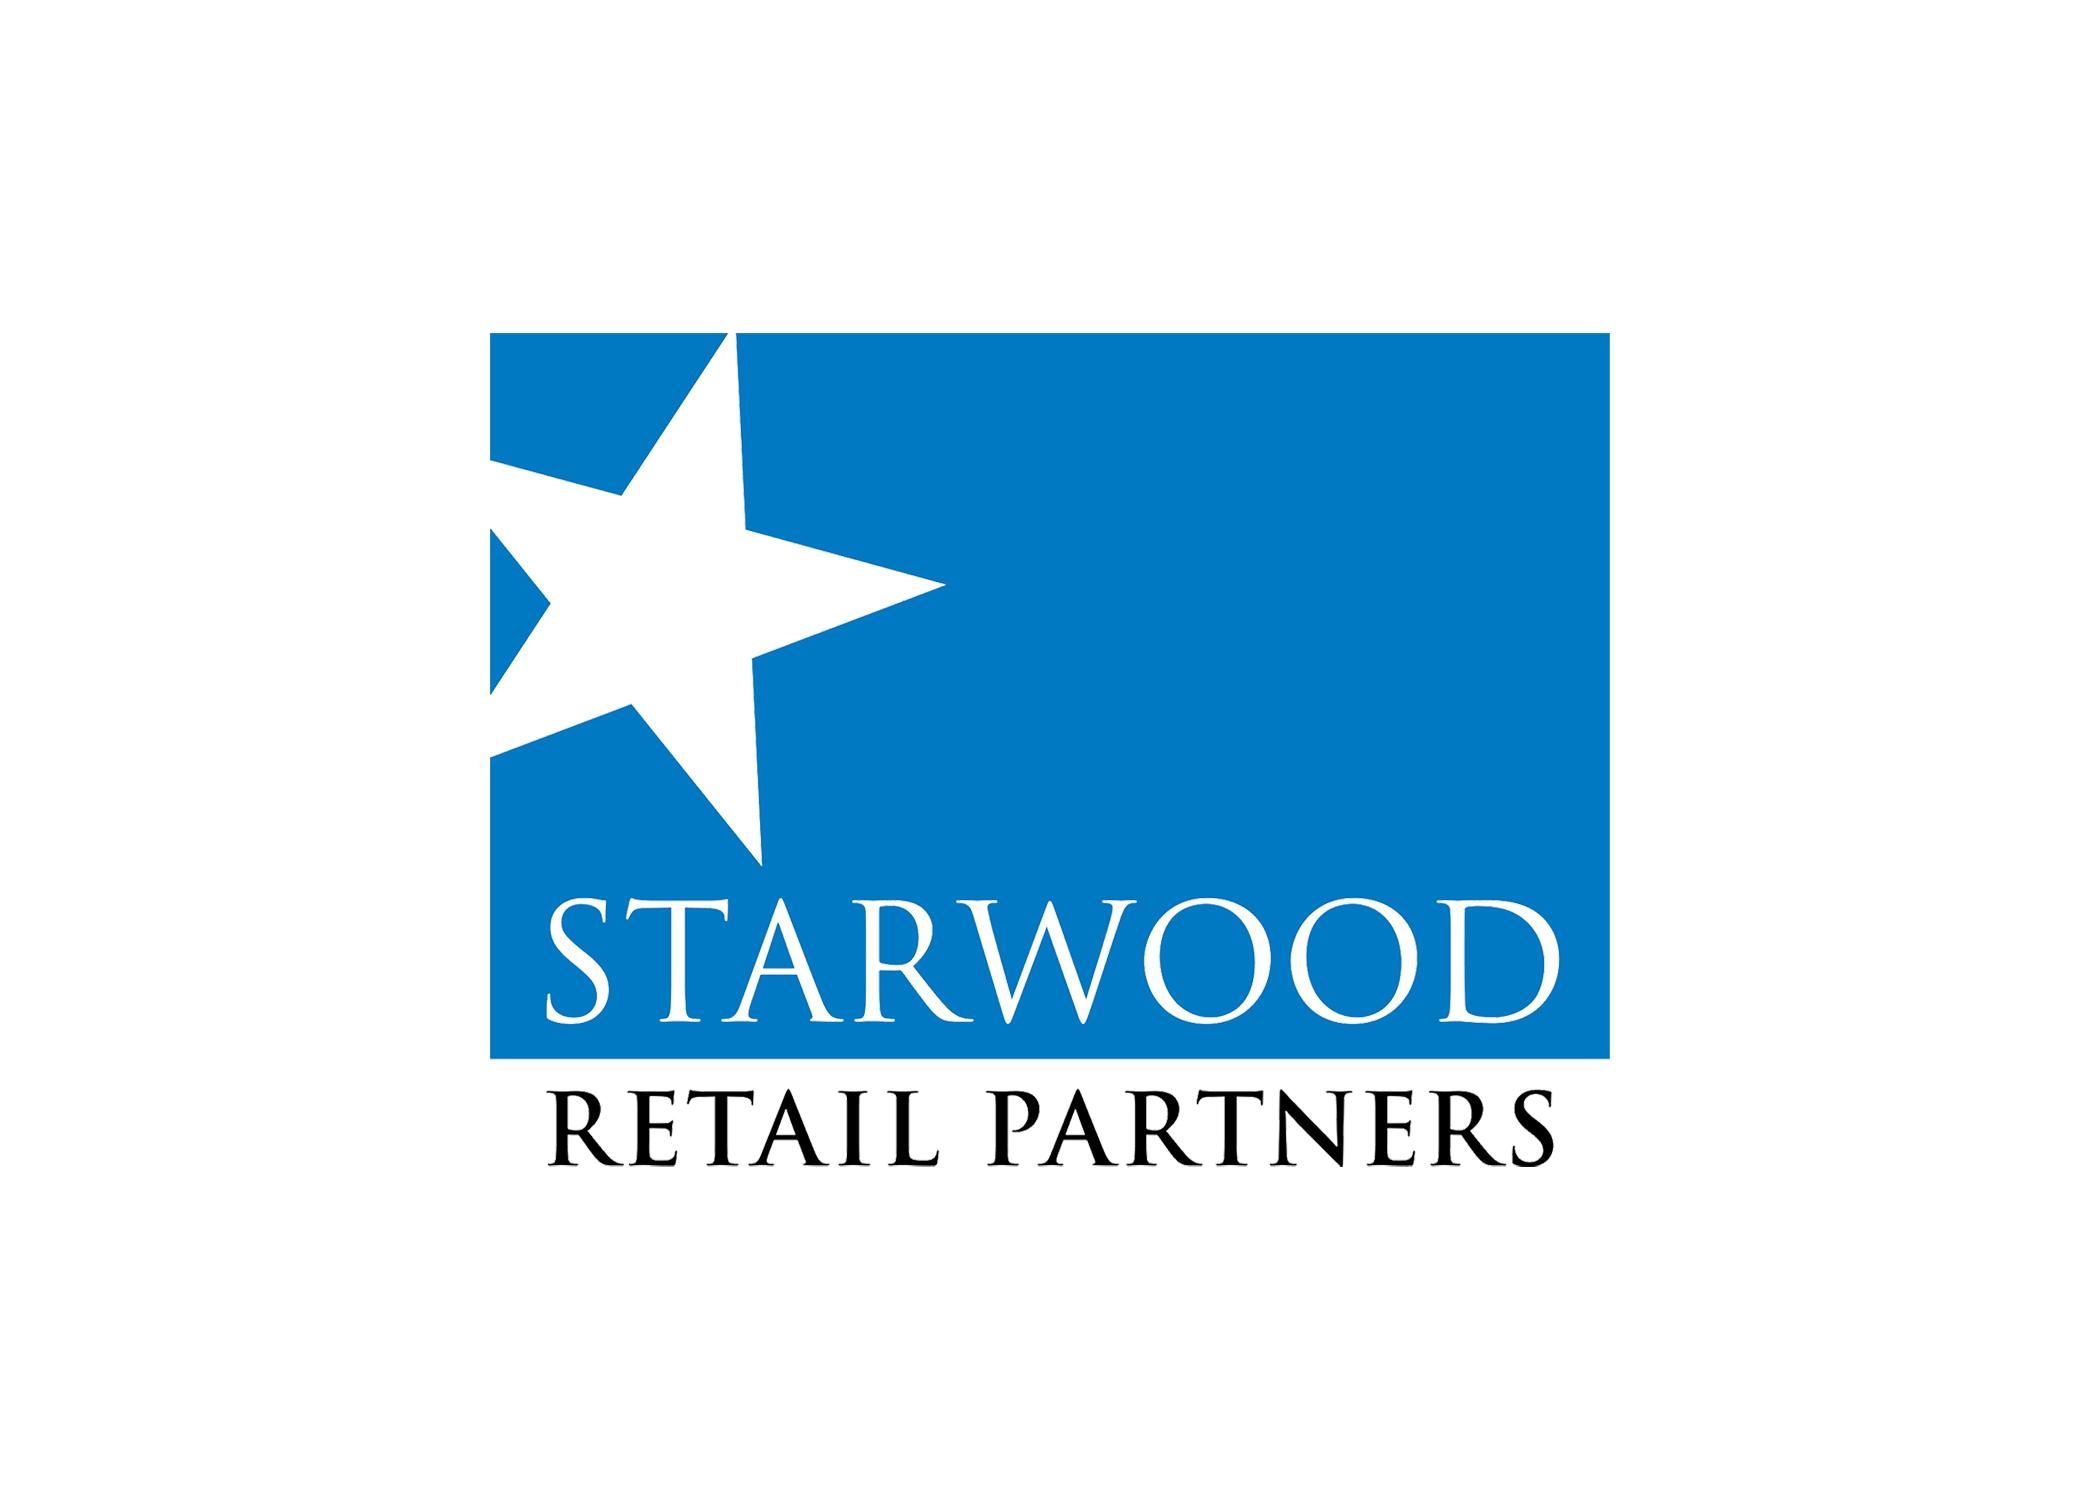 Starwood.jpg